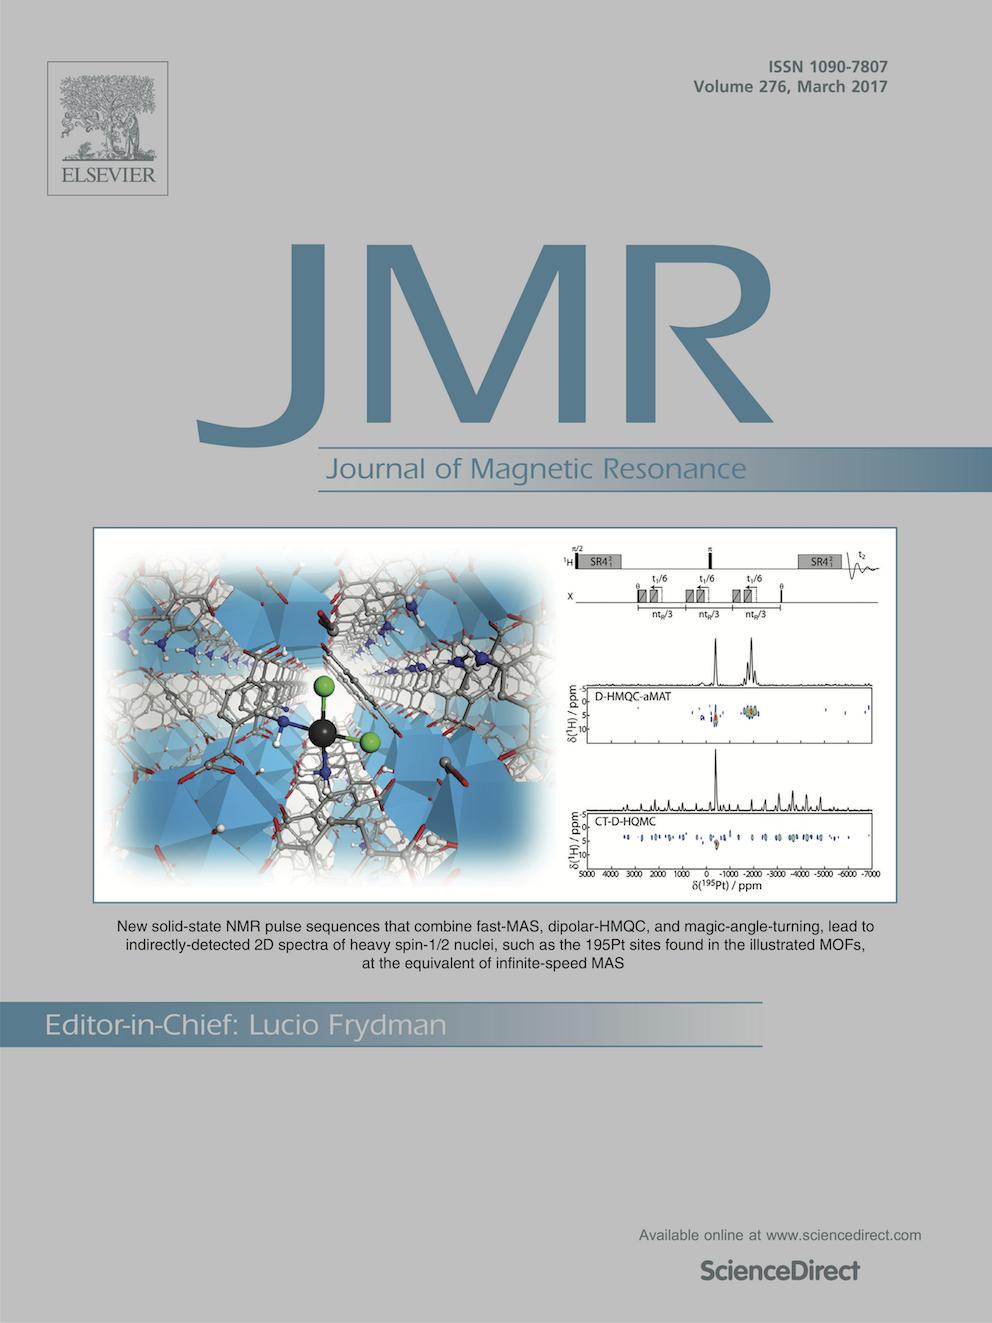 jmr_cover